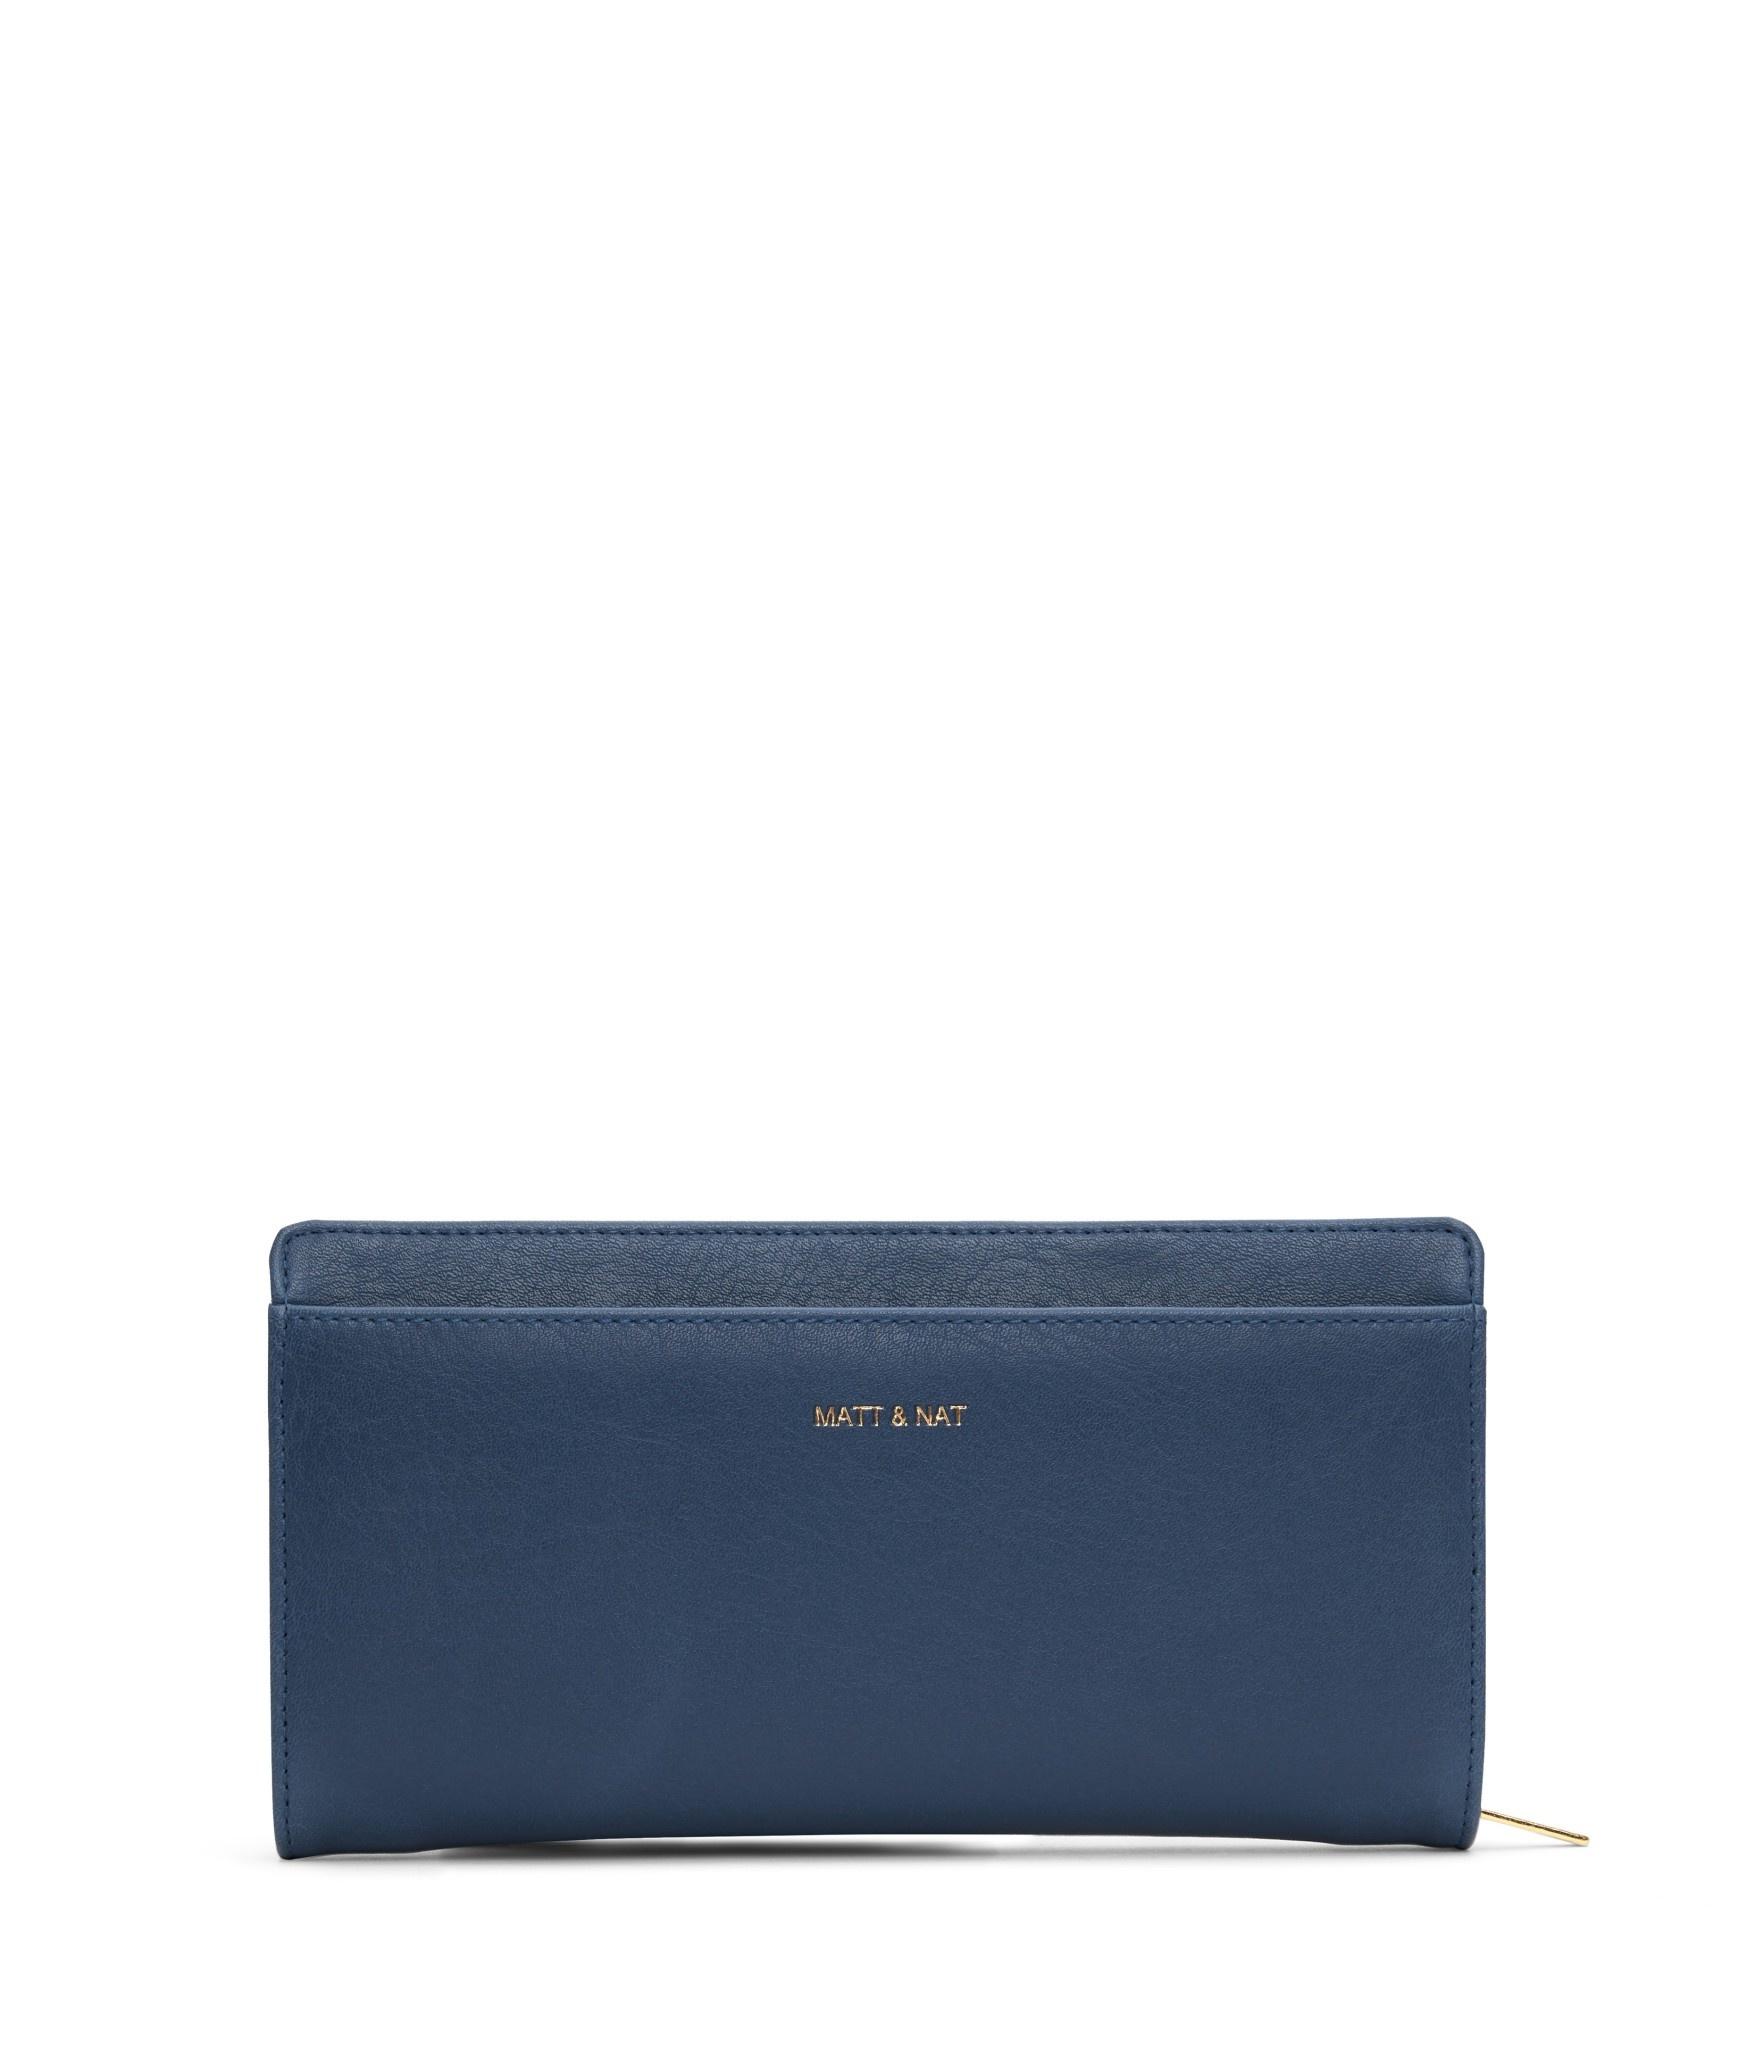 Webber Vintage Wallet Cosmo Blue-4